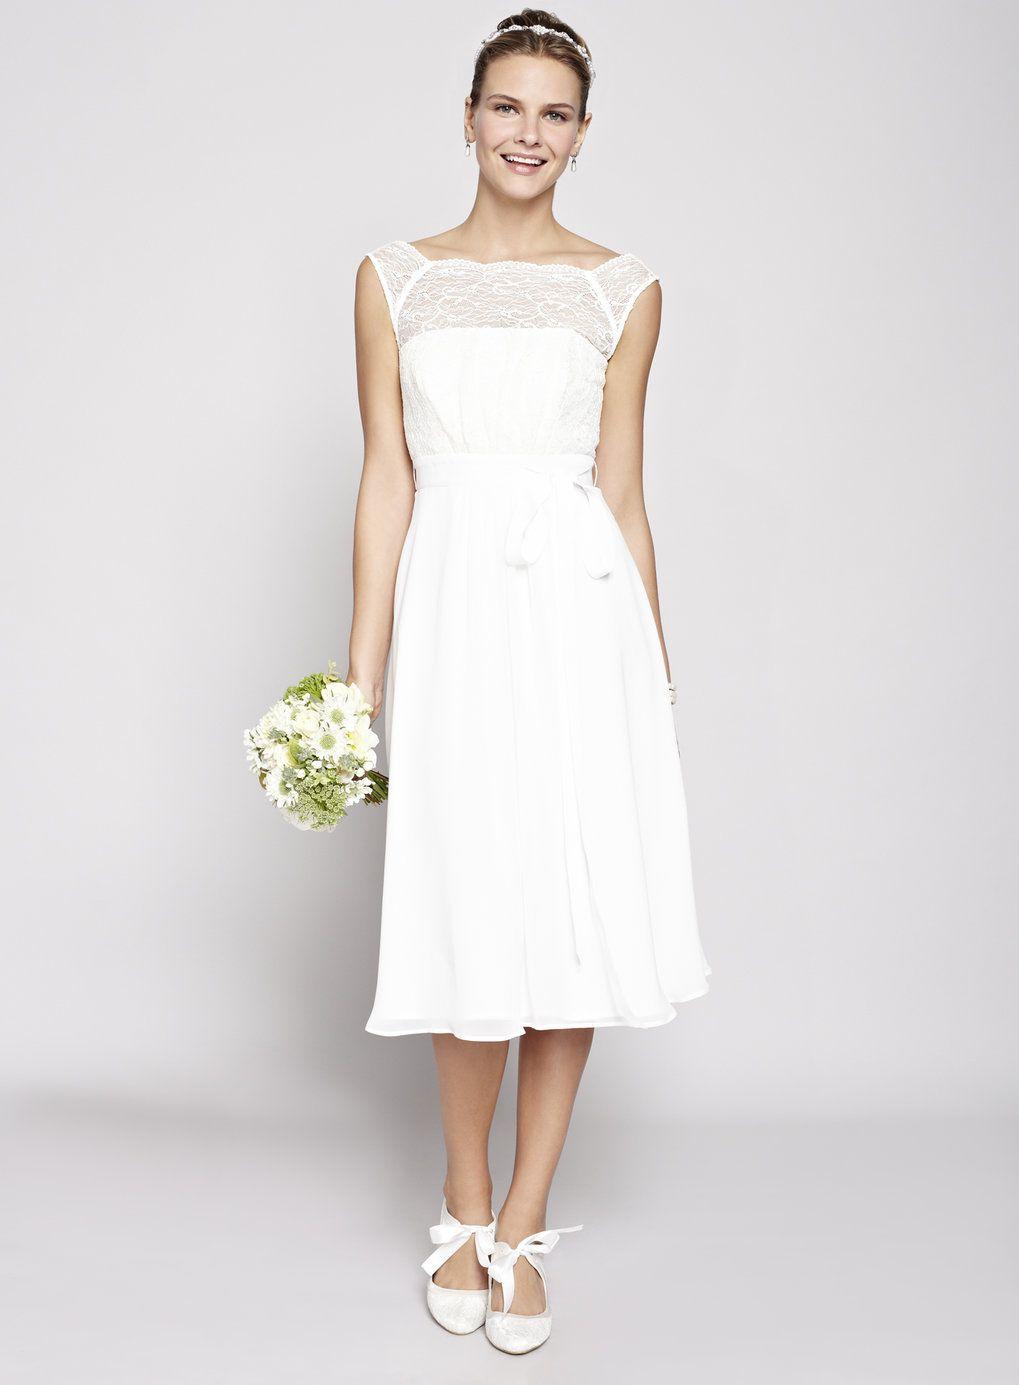 Ivory Chloe Bridal Dress Bhs Wedding Dresses Uk Short Wedding Dress Wedding Dress Search